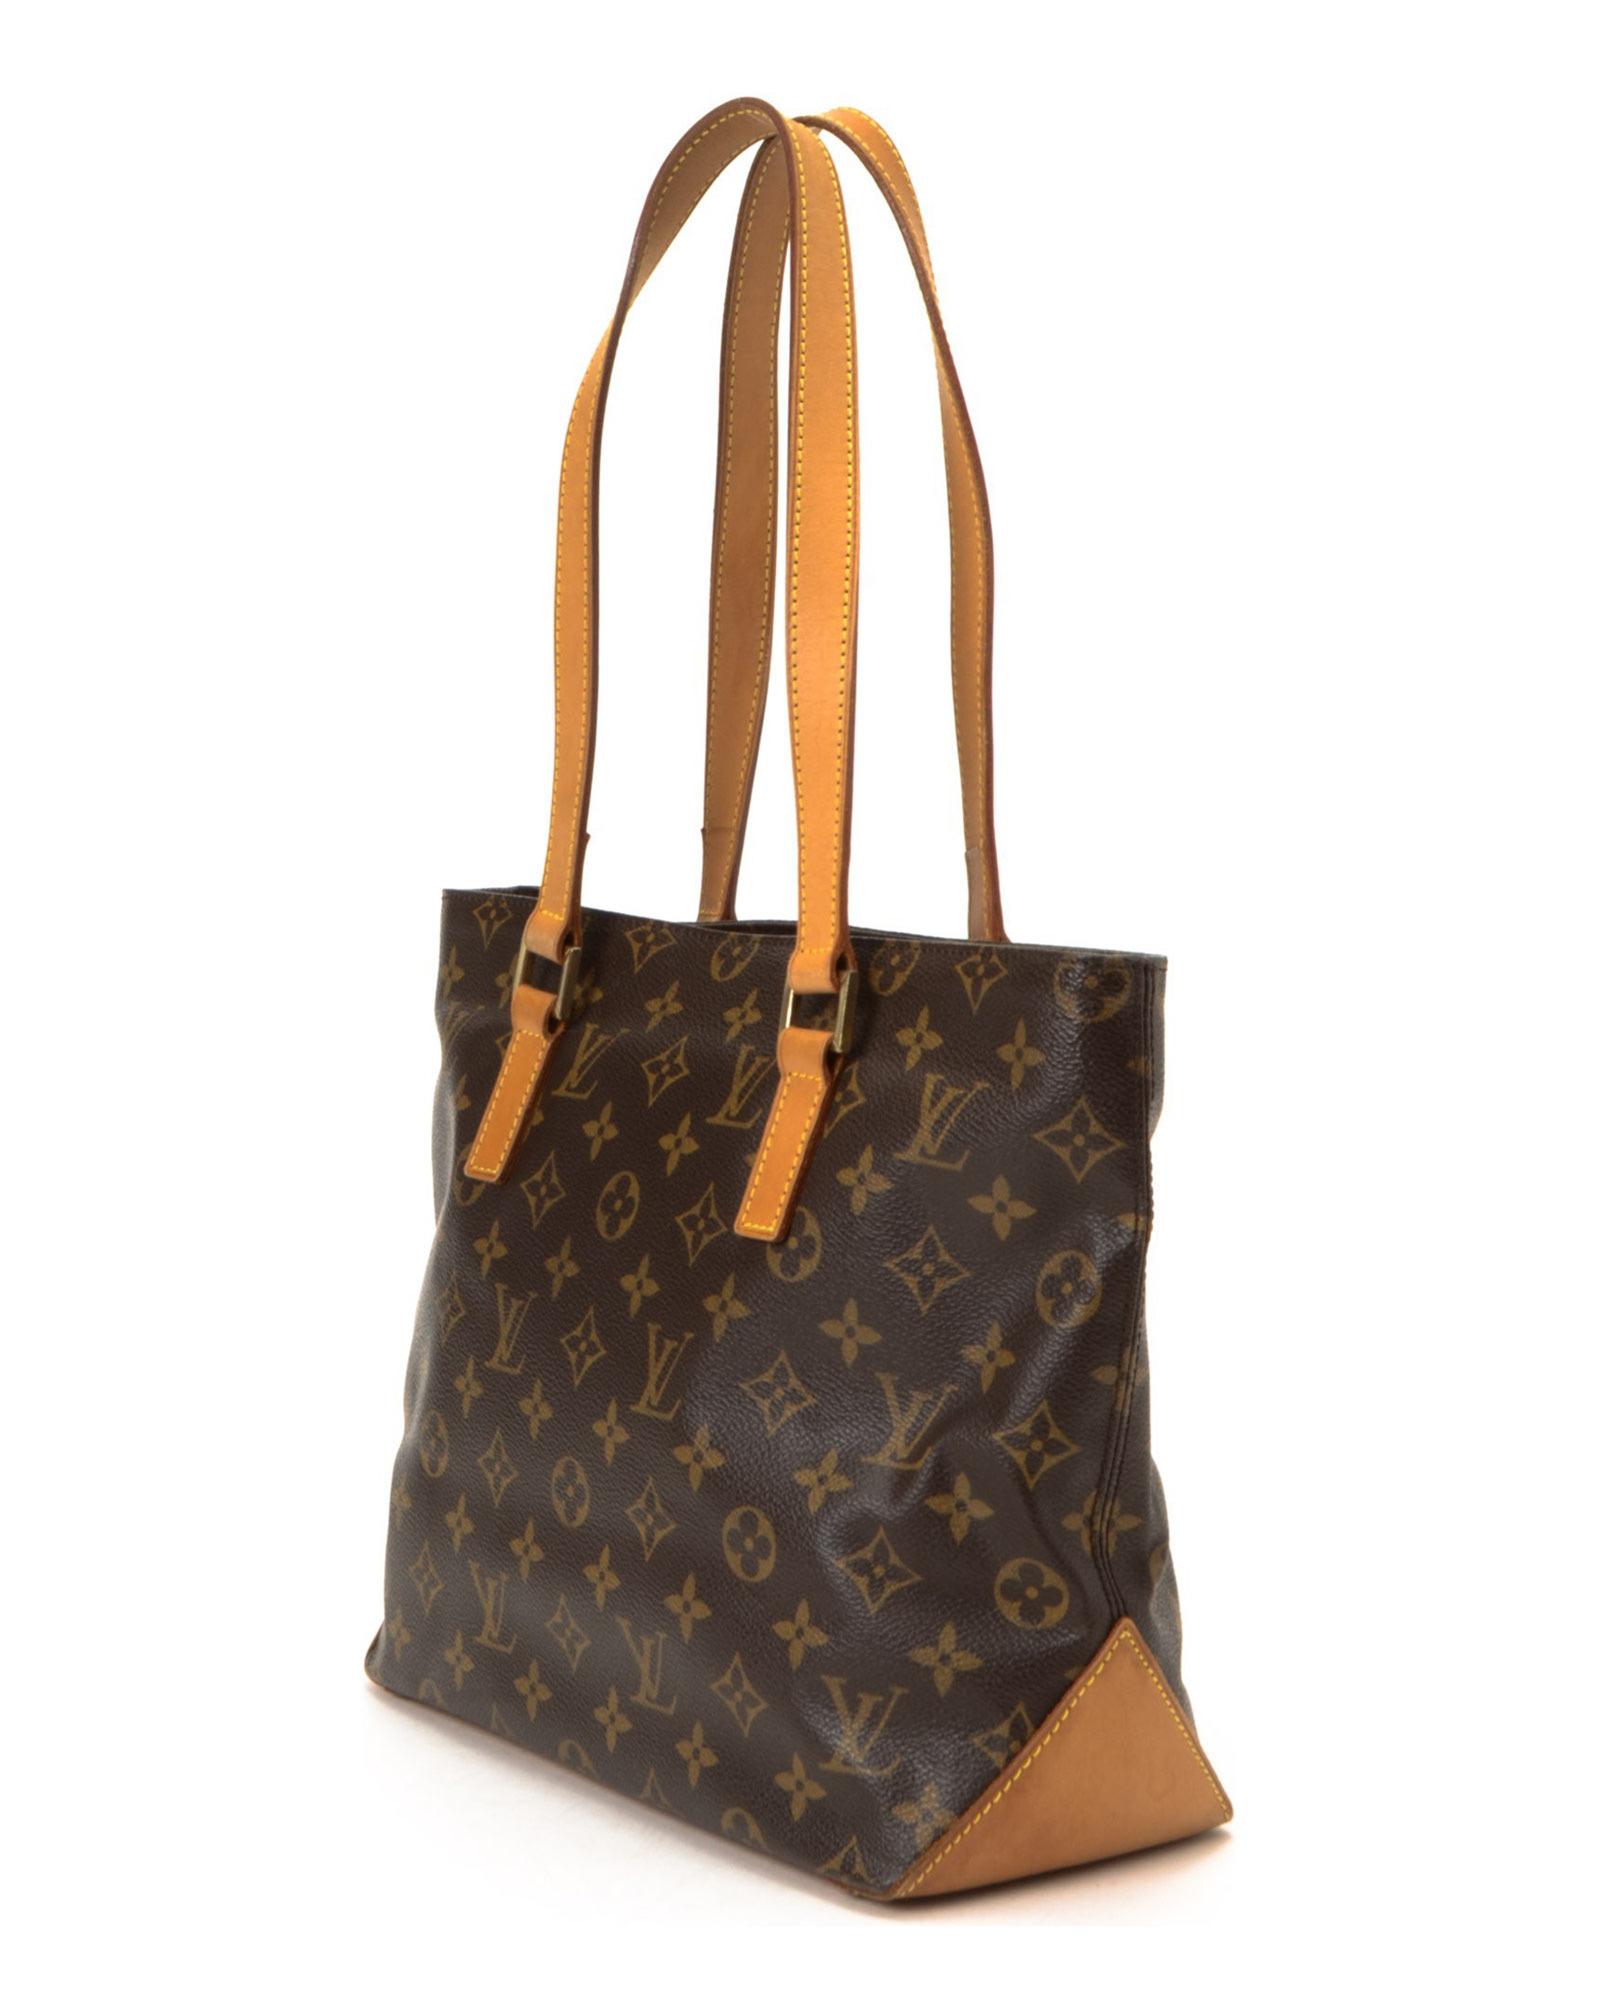 Louis vuitton tote bag vintage in brown lyst for Louis vuitton miroir bags